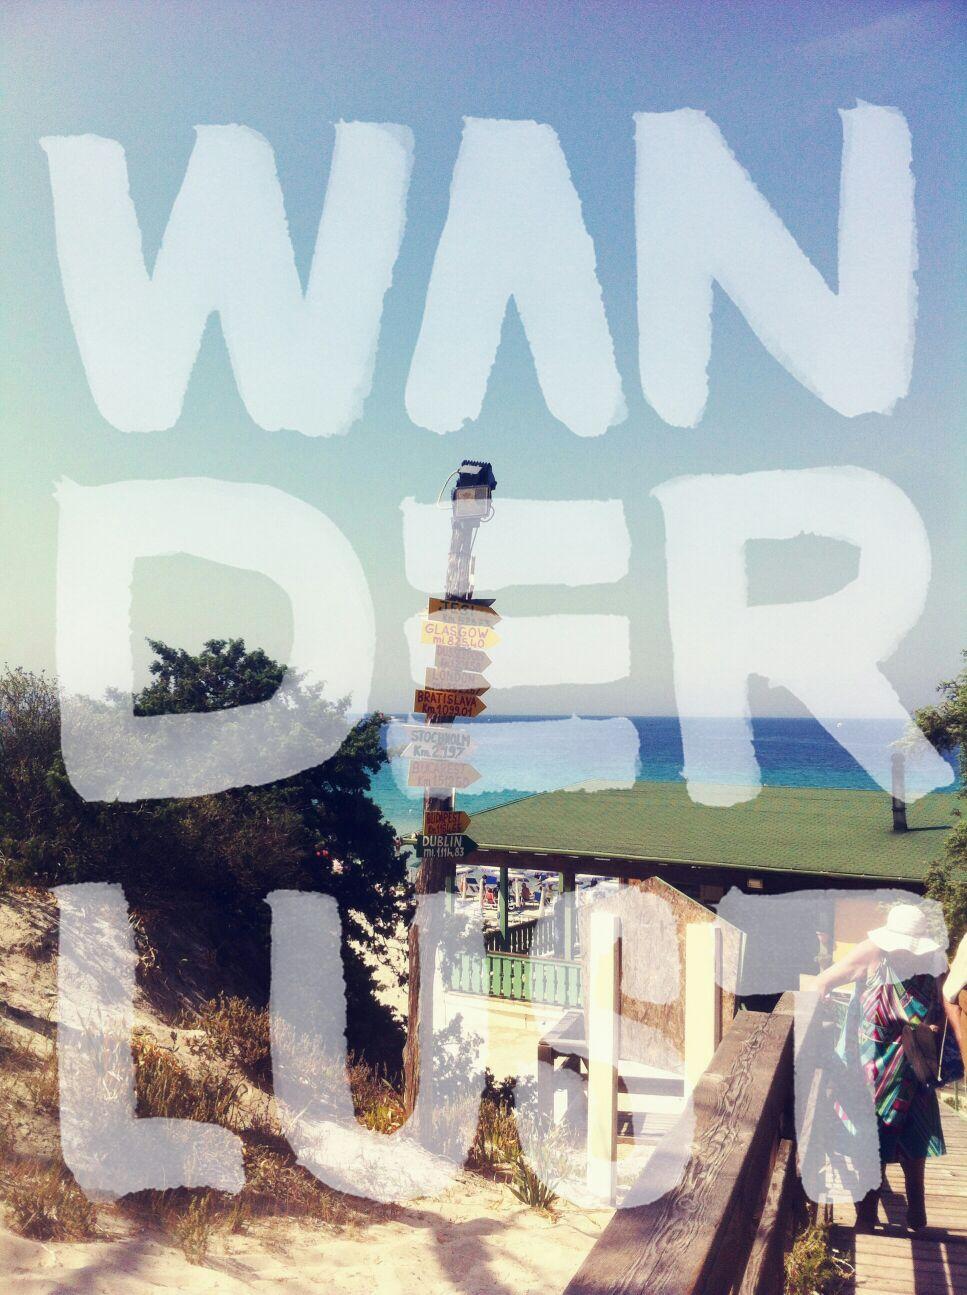 Wanderlust - Rubrica Viaggi - Gennaio 2016